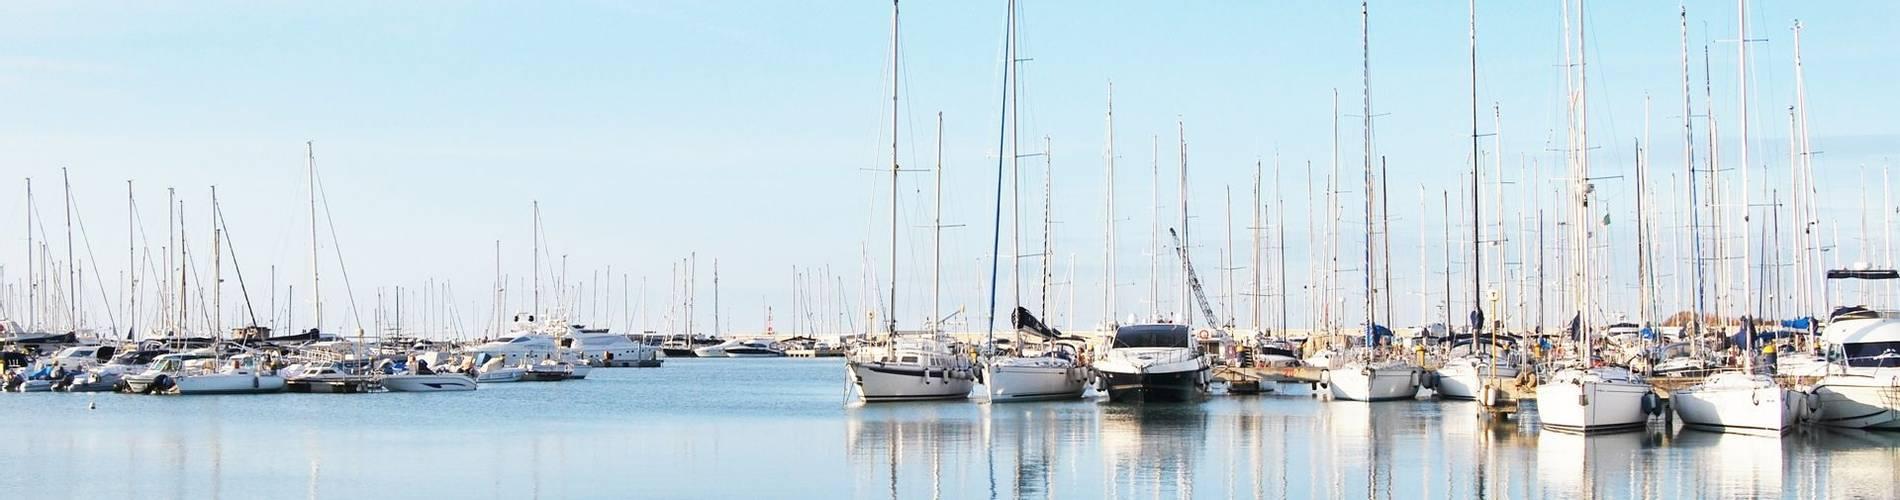 Pescara JPEG.jpg